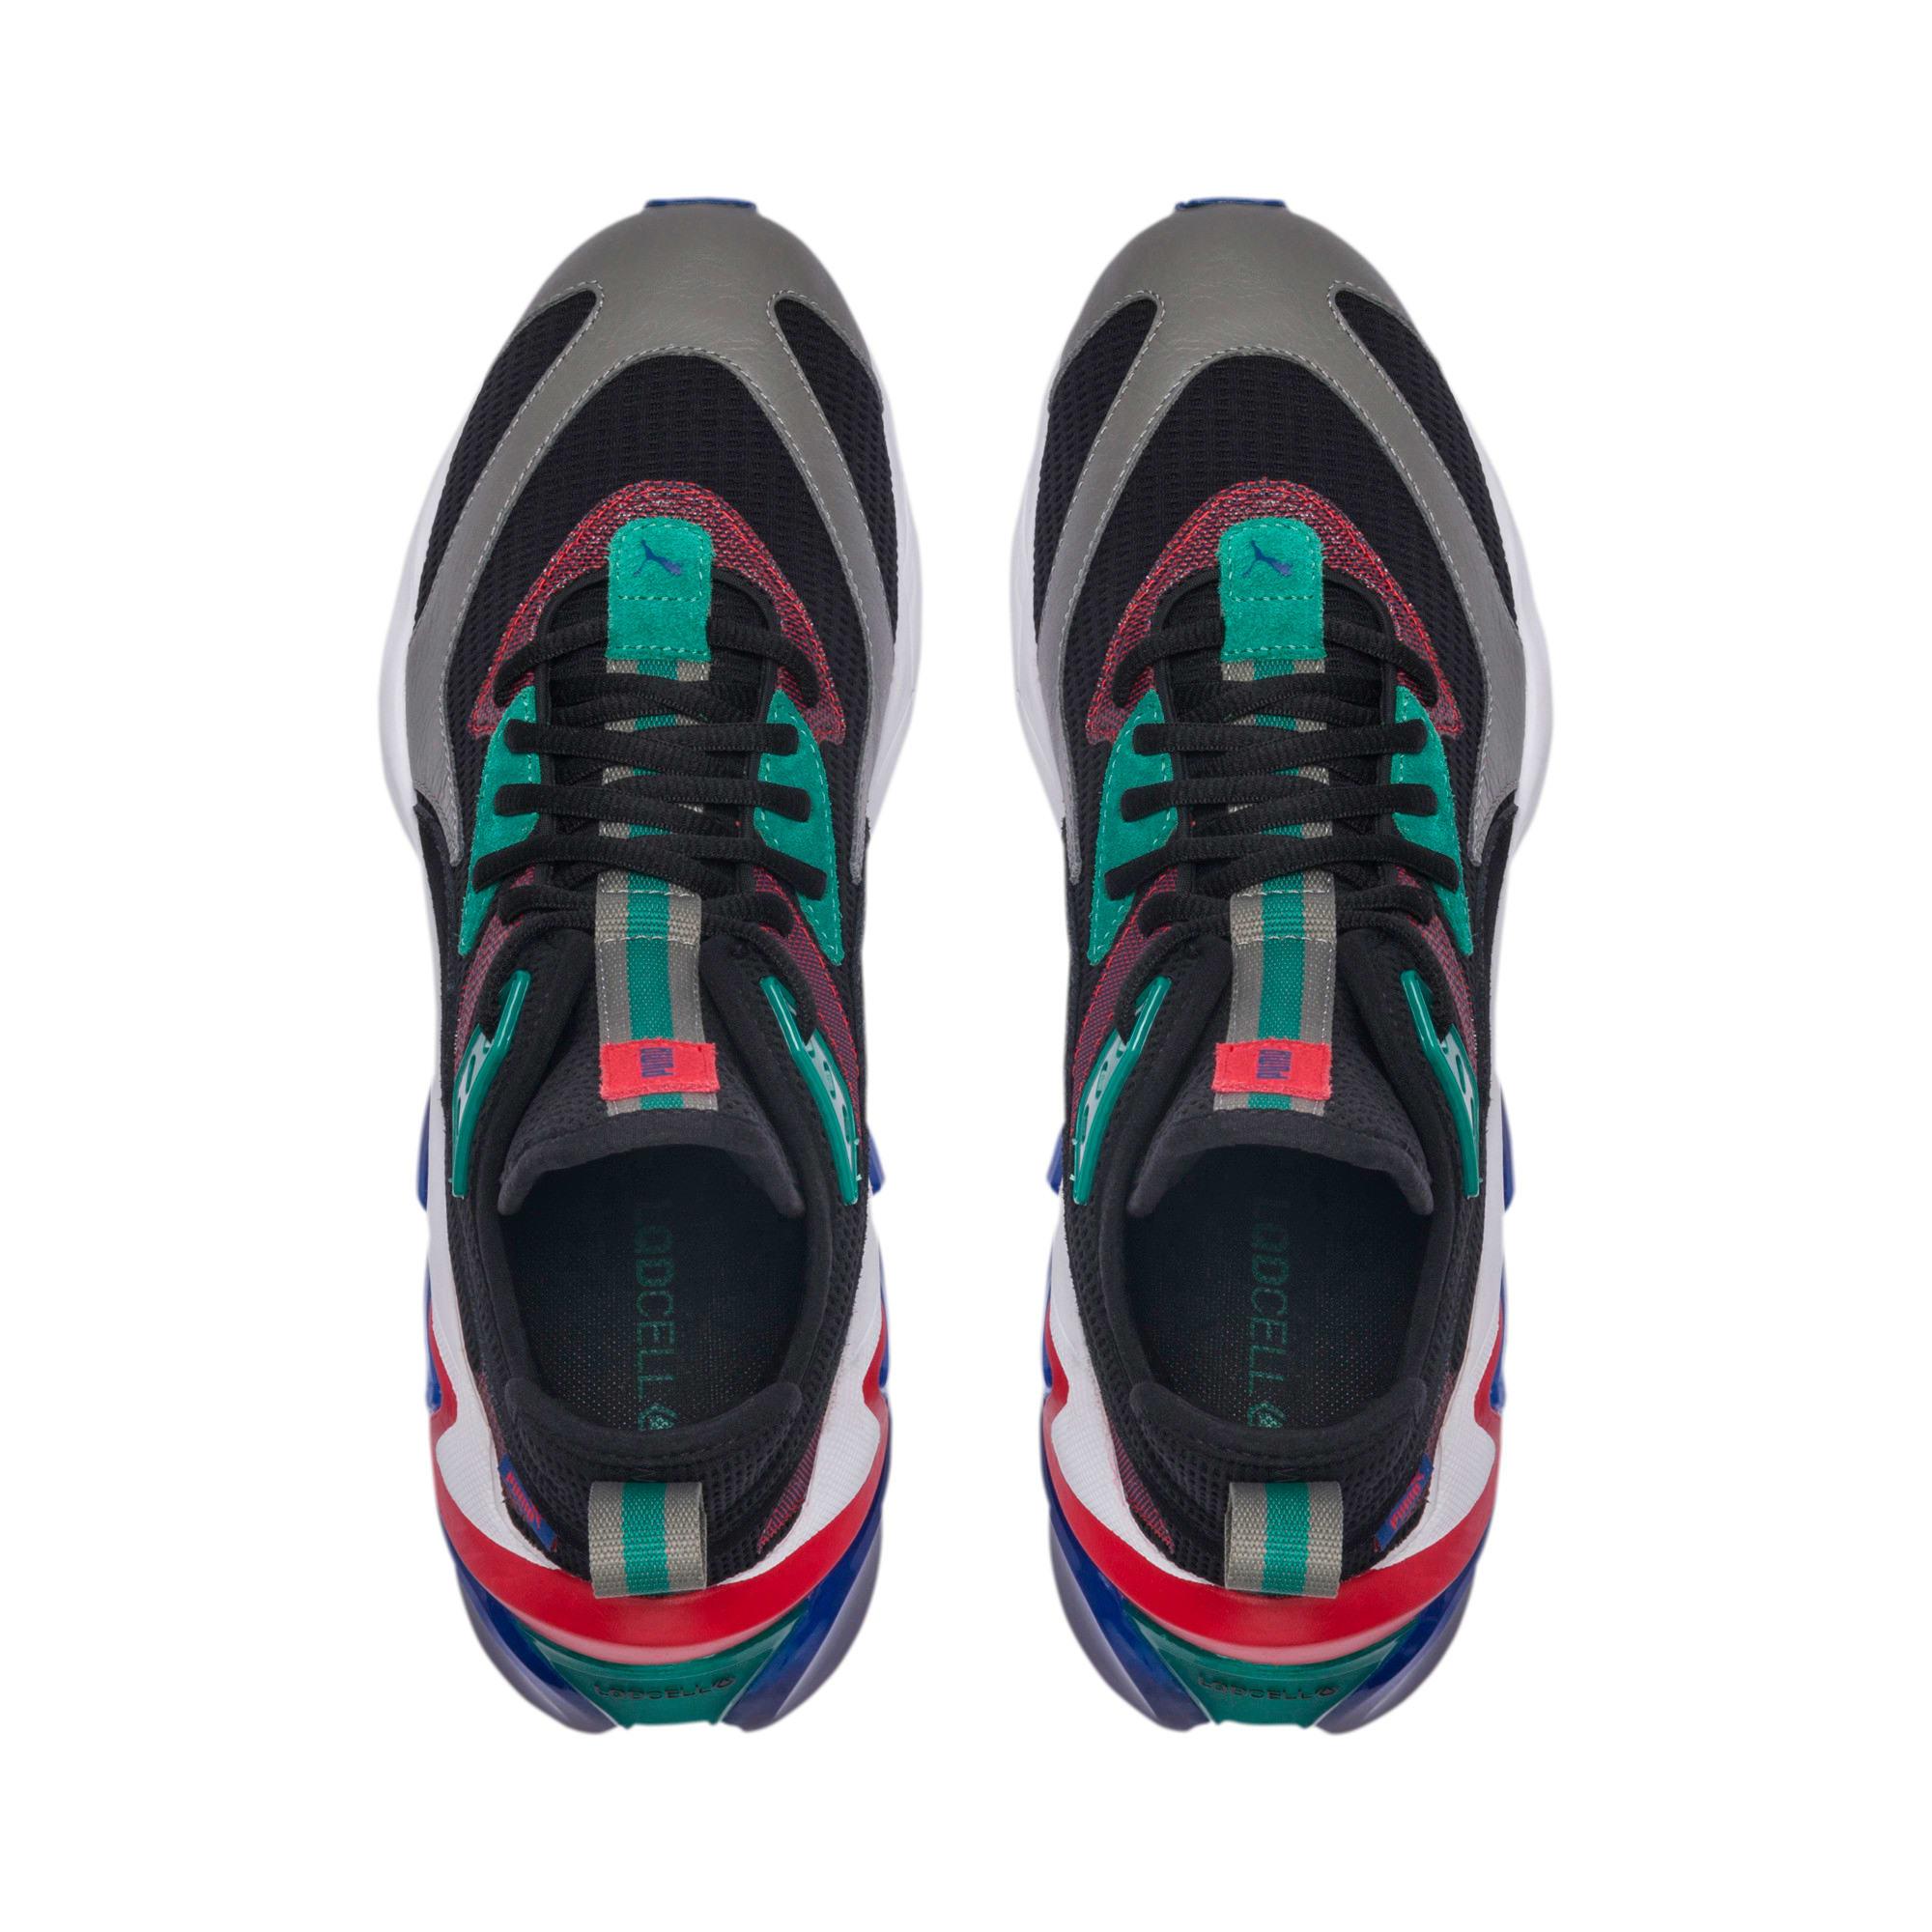 Thumbnail 6 of LQDCELL Origin Men's Training Shoes, Puma Black-Cadmium Green, medium